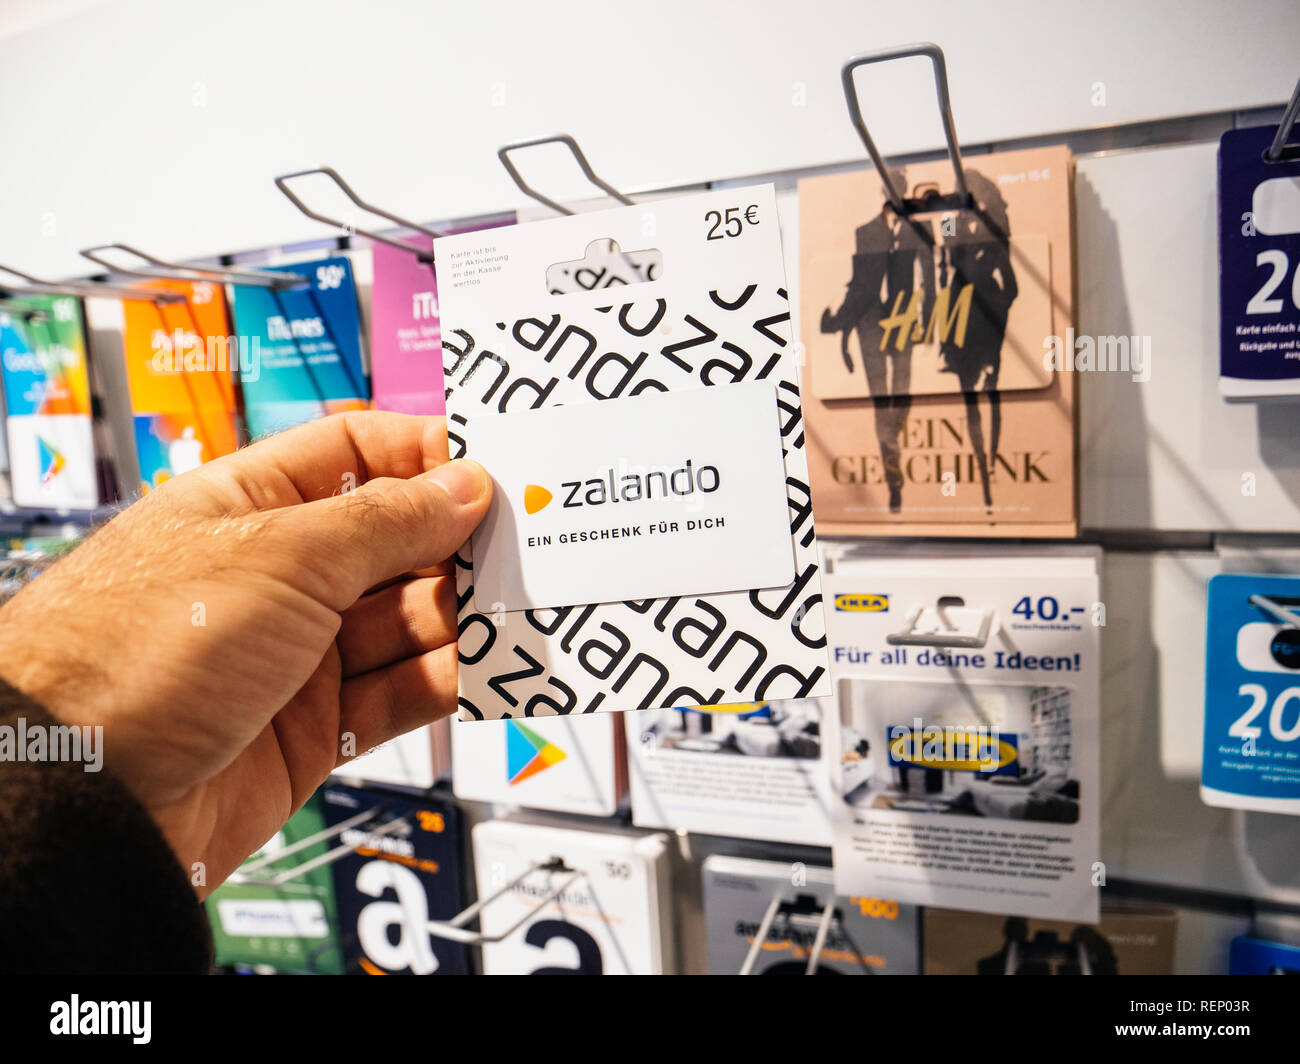 52cbcdba FRANKFURT, GERMANY - OCT 6, 2017: 50 Euro card in man hand point